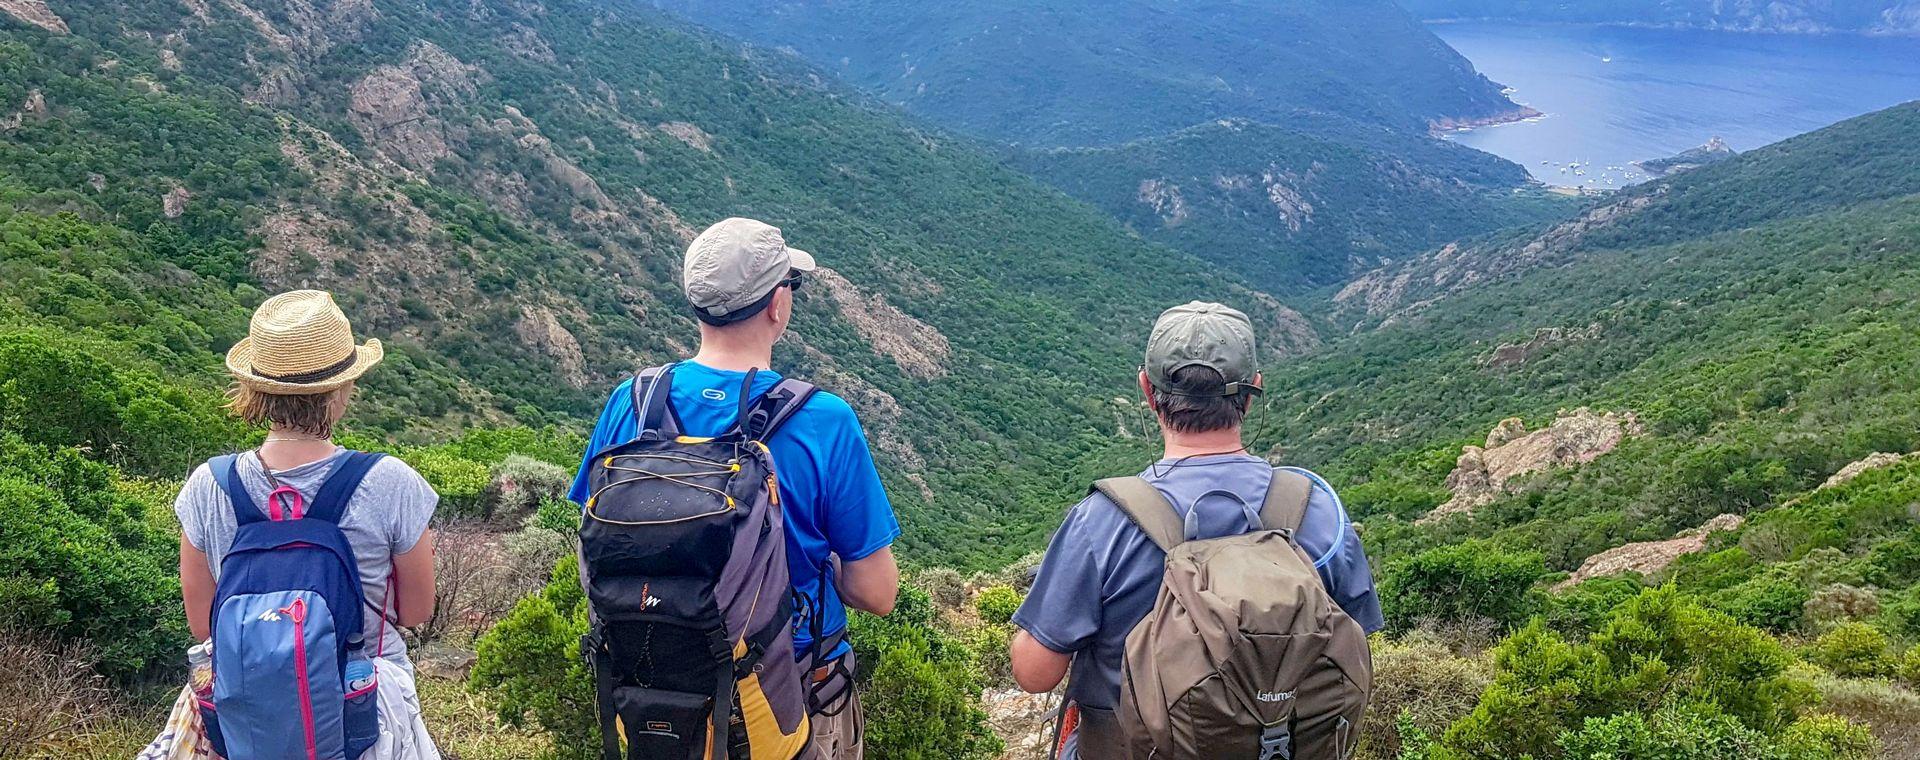 Voyage à pied : Mare e Monti de Piana à Calvi